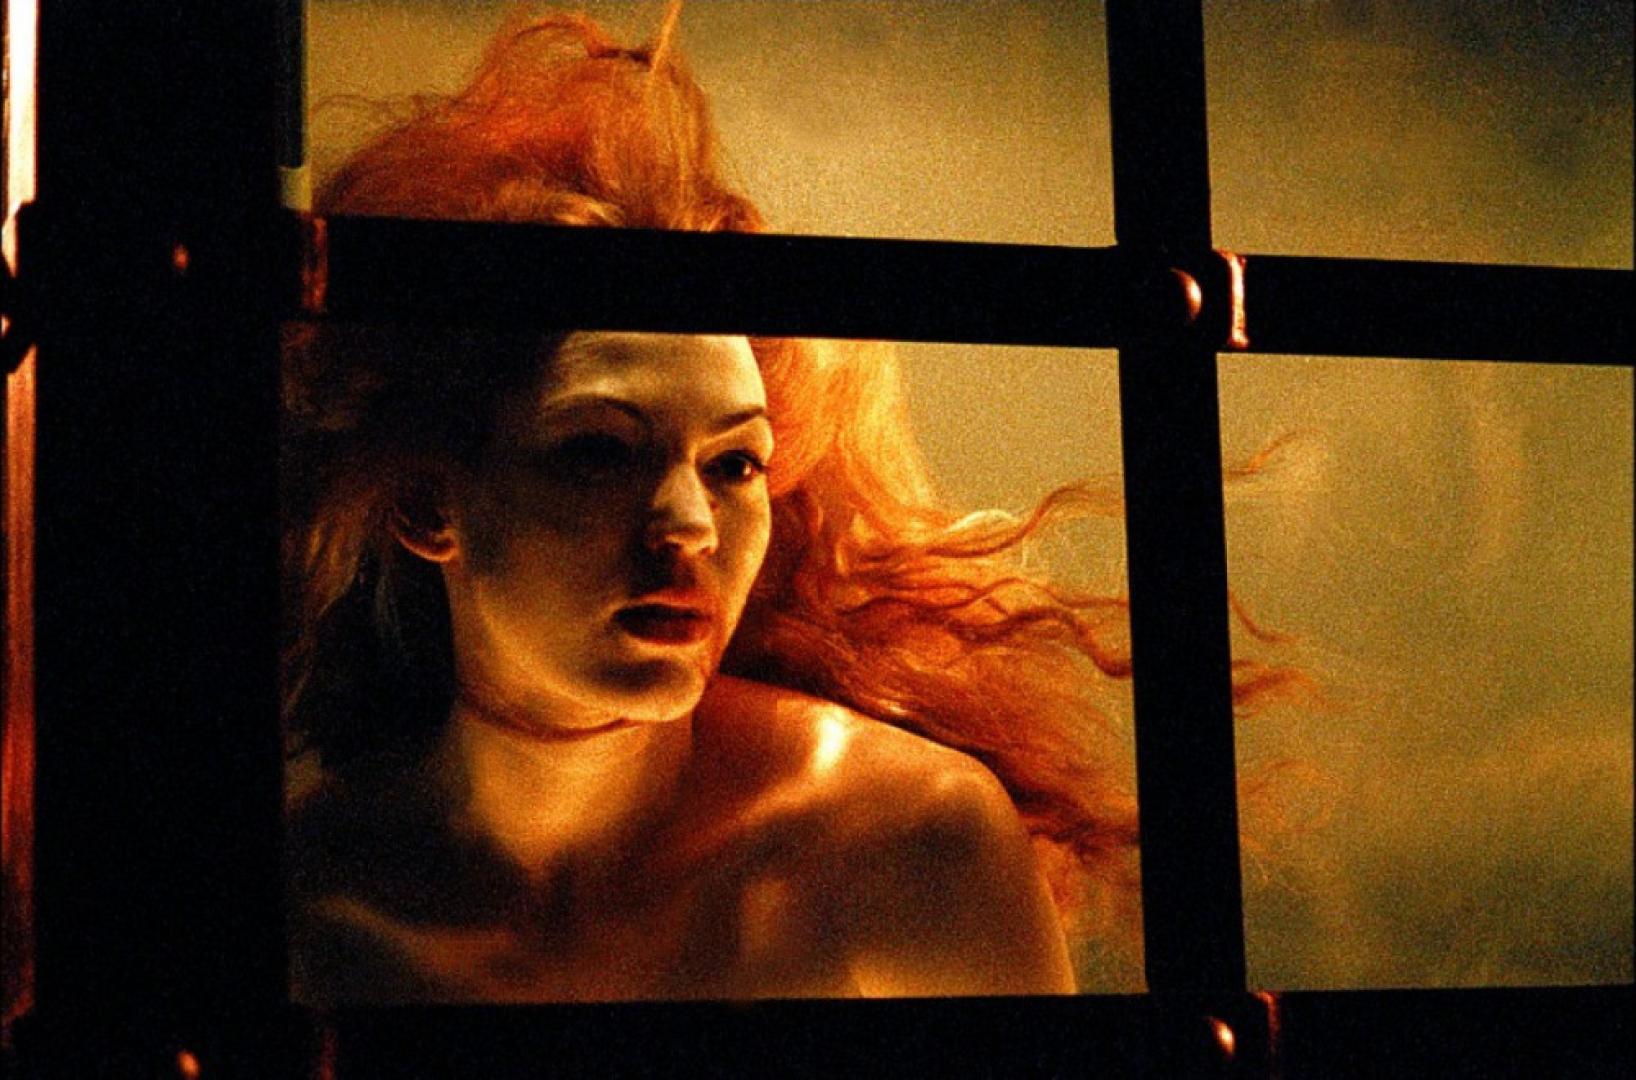 Mermaid Chronicles Part 1: She Creature - A tengeri szörny (2001)